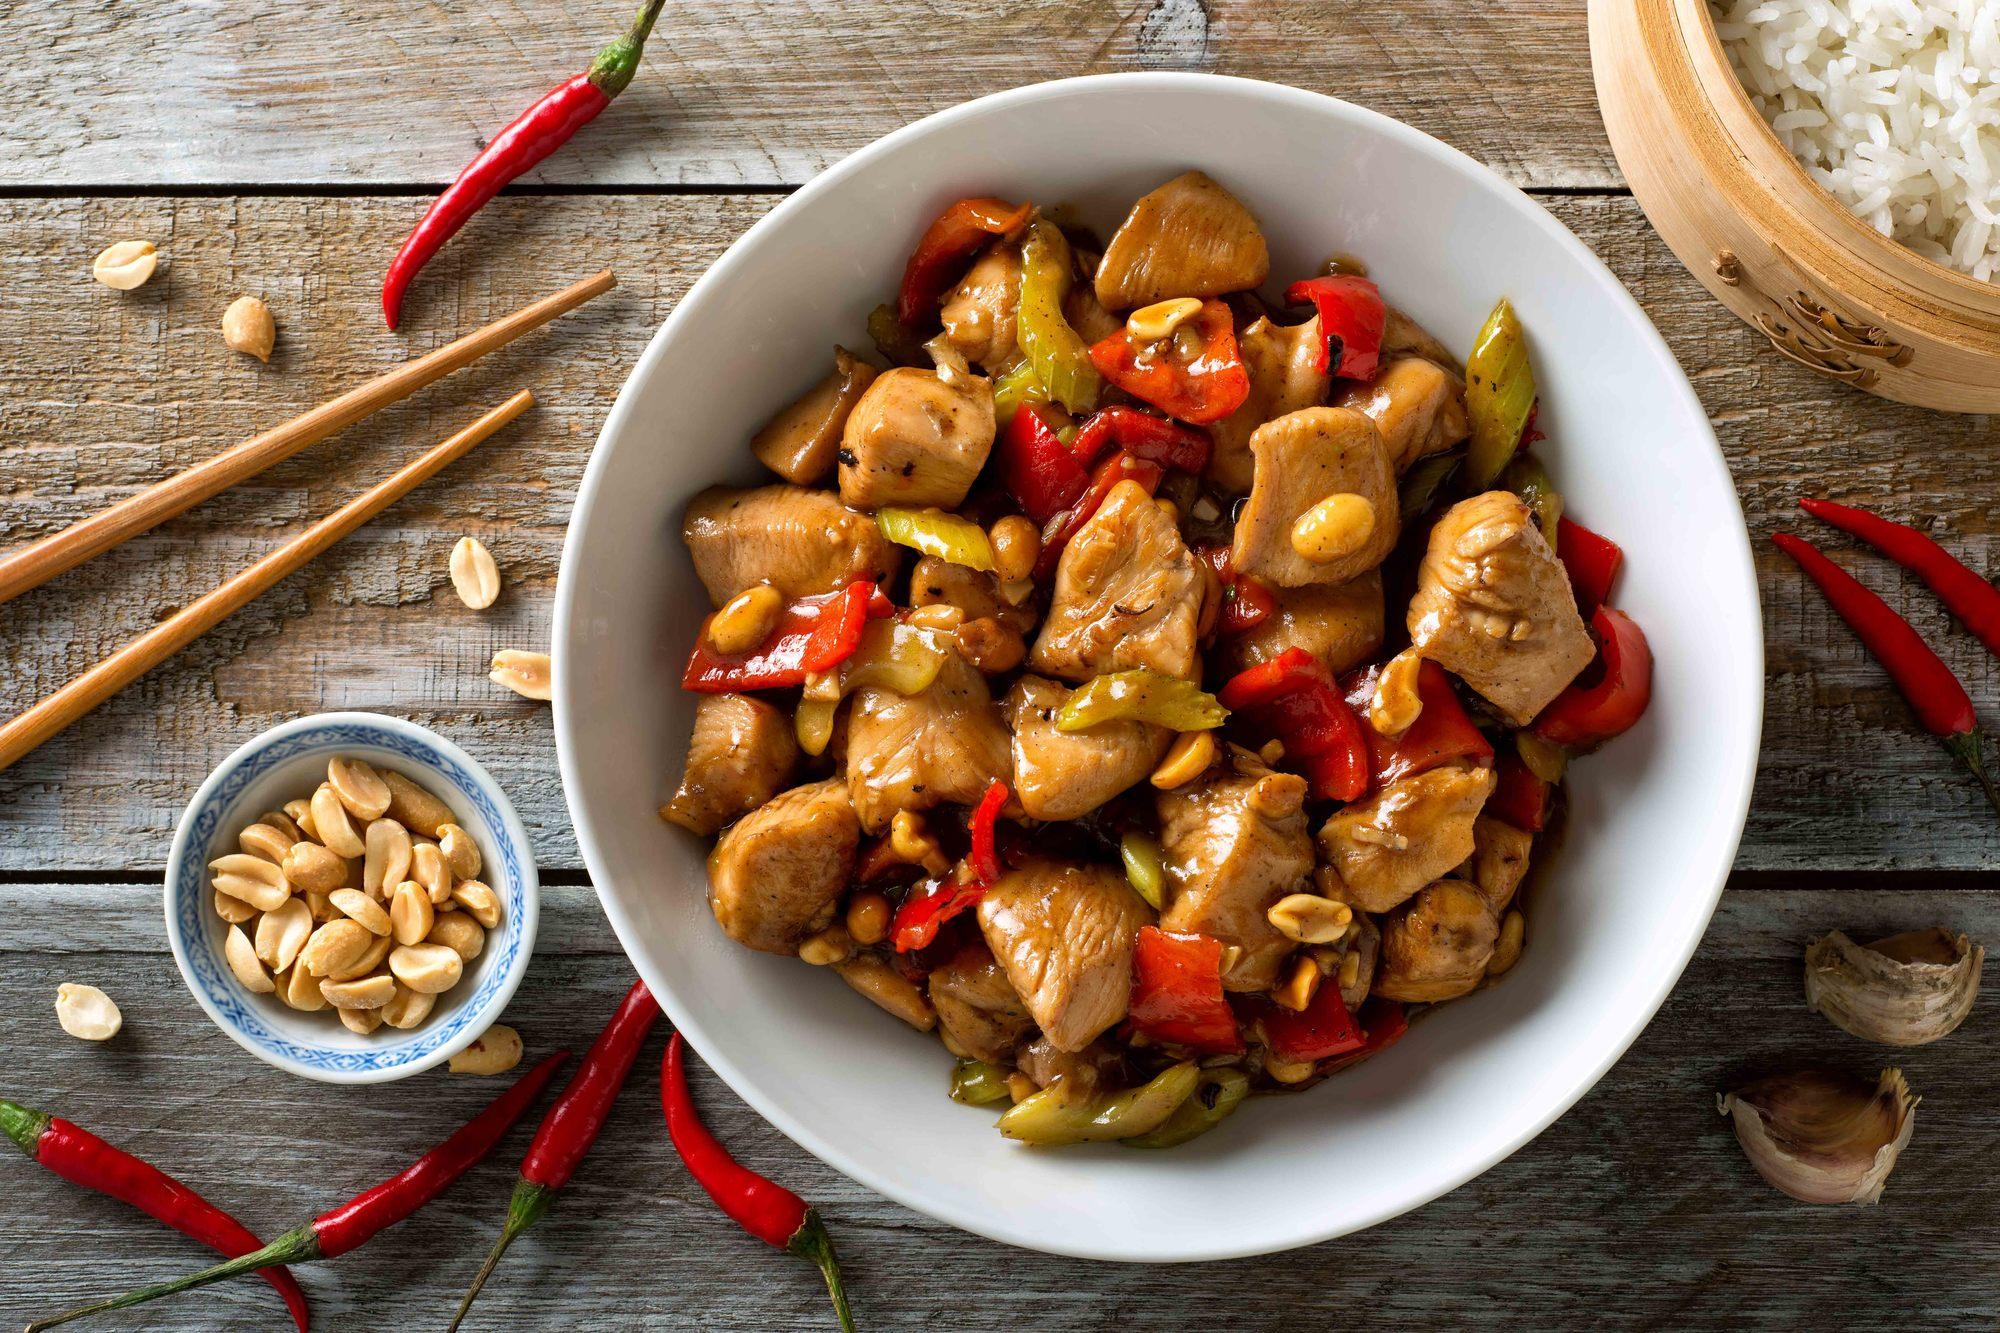 Resep Ayam Kung Pao Paling Populer - Masak Apa Hari Ini?